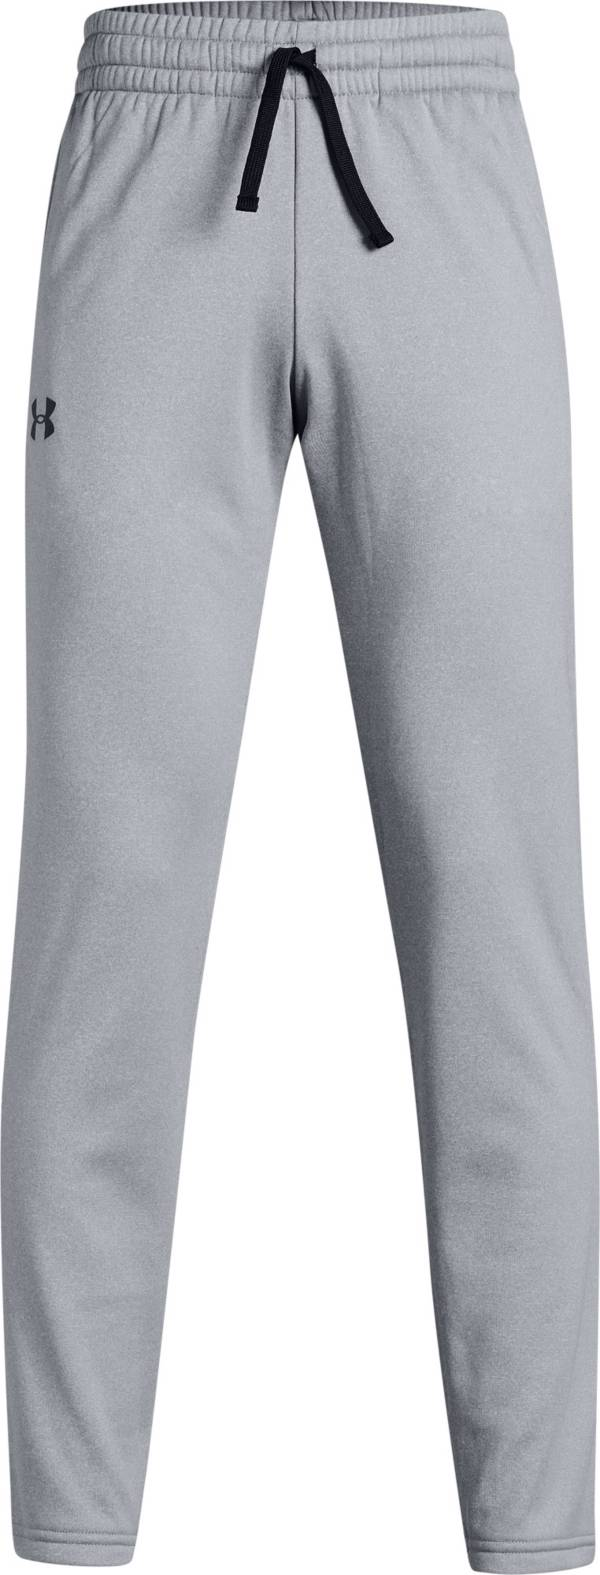 Under Armour Boys' Armour Fleece Pants product image